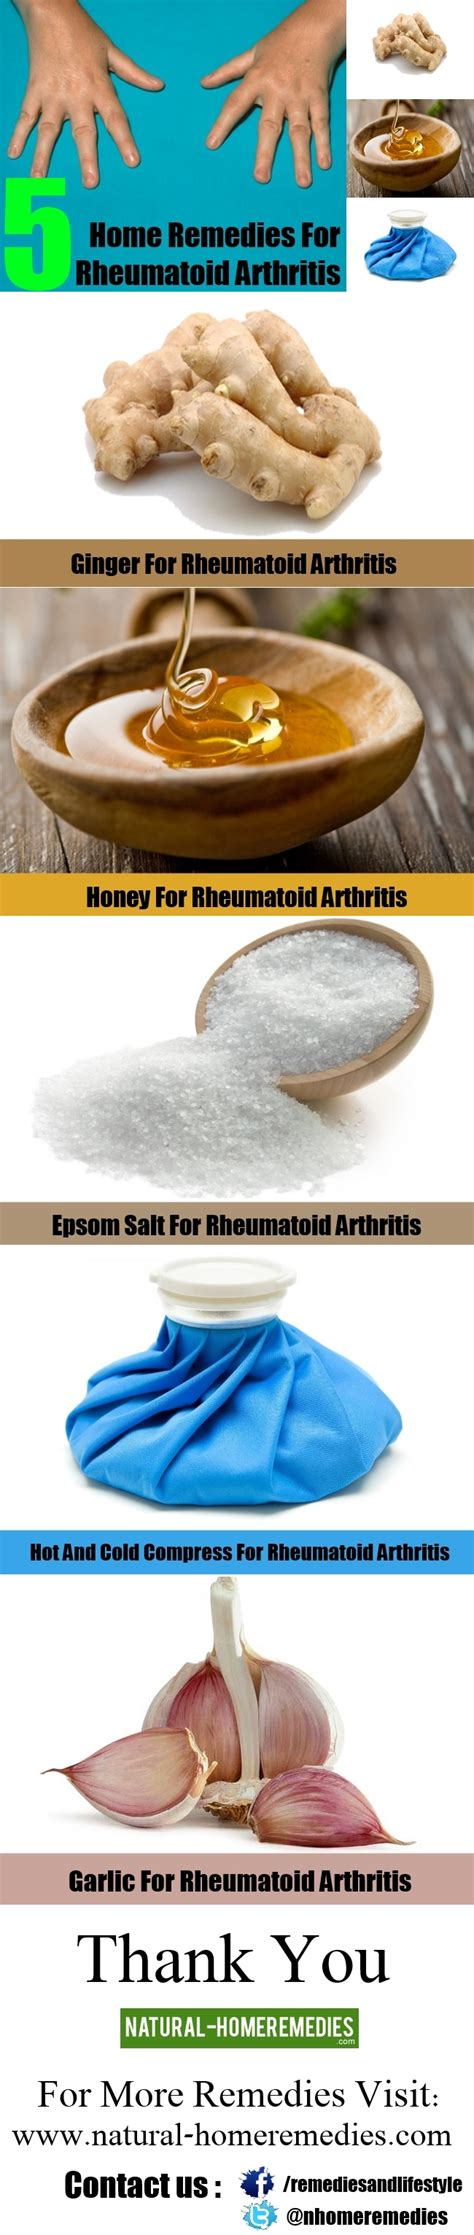 best treatment for rheumatoid arthritis top 5 home remedies for rheumatoid arthritis